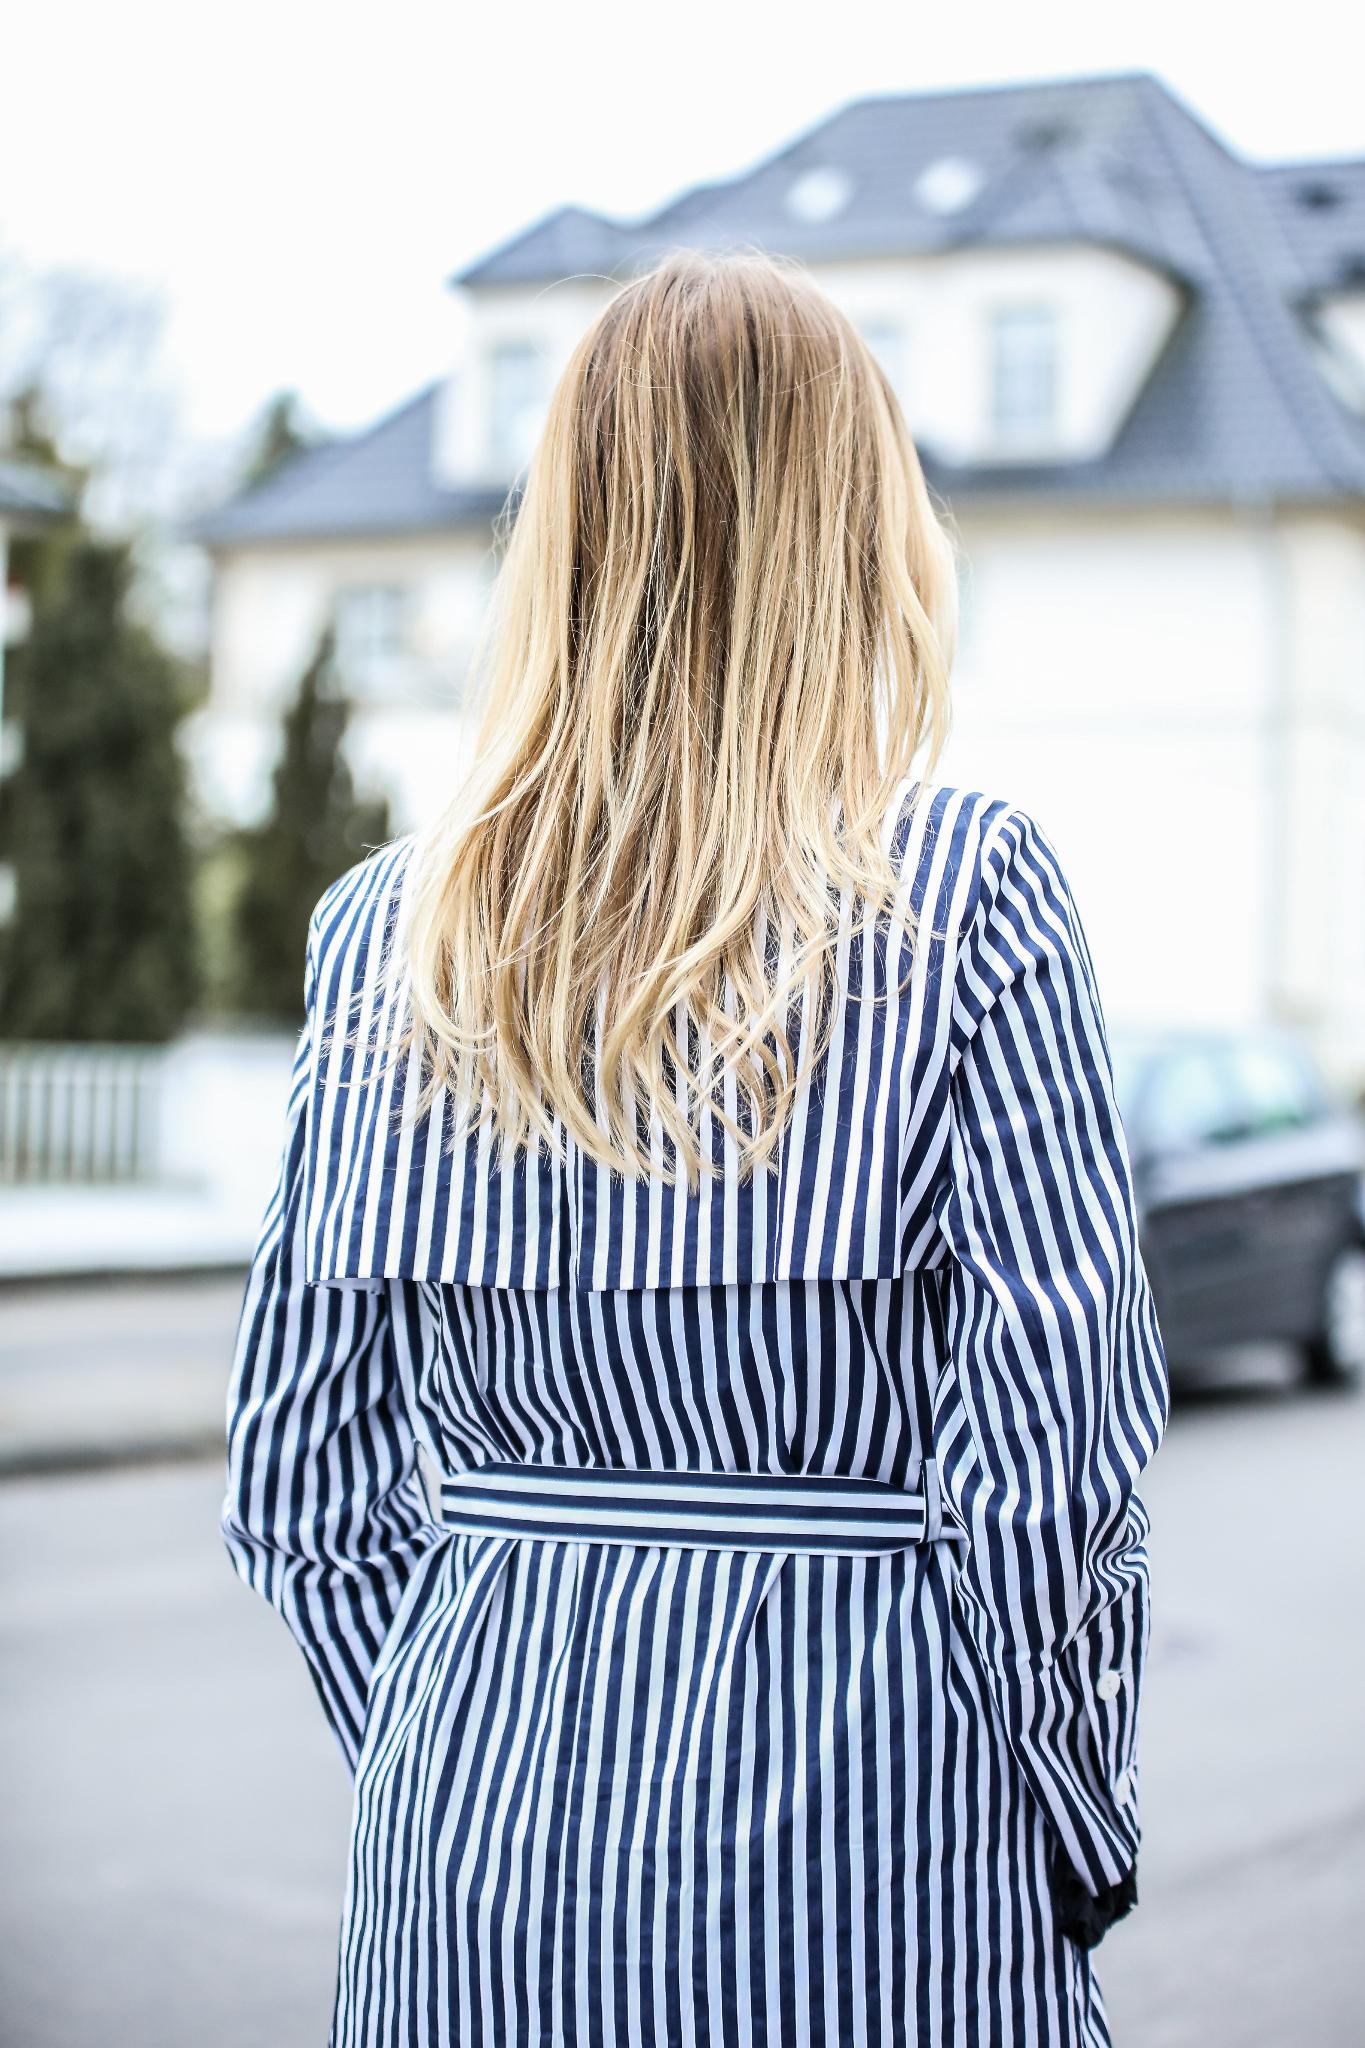 MOD-by-Monique-Fashion-Looks-Striped-Coat-Big-Volants-12